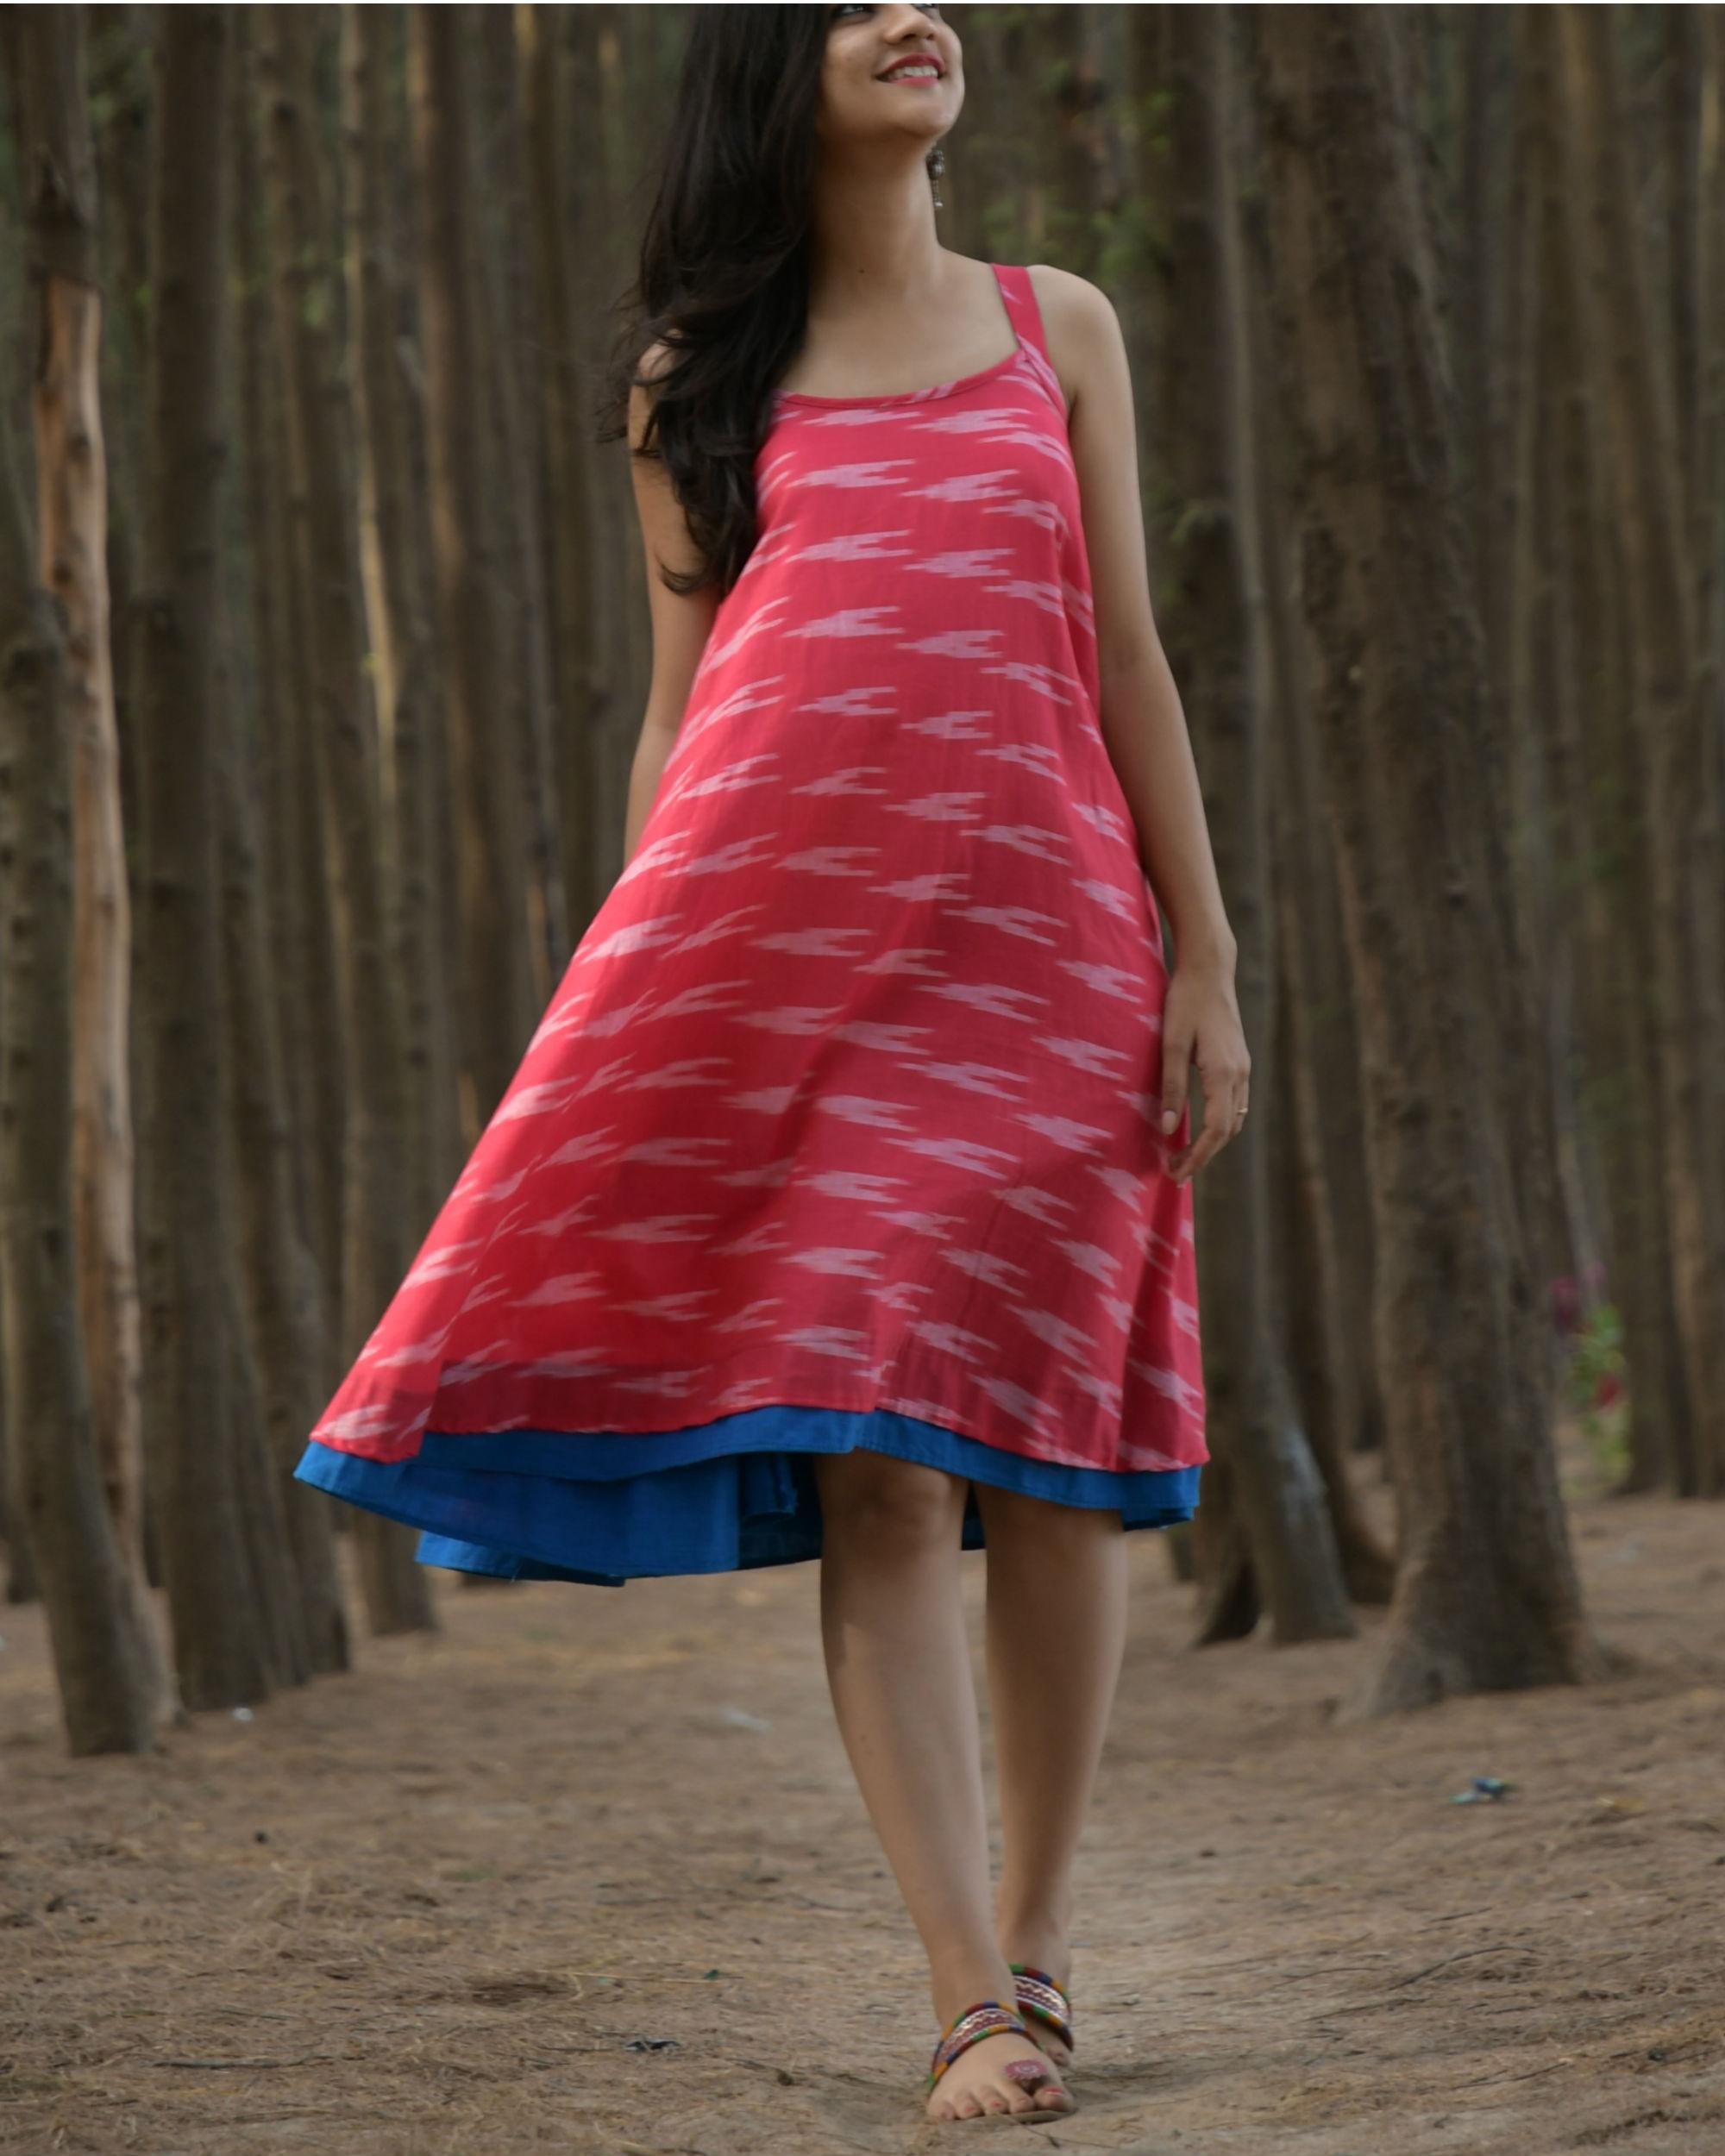 Pink swing dress